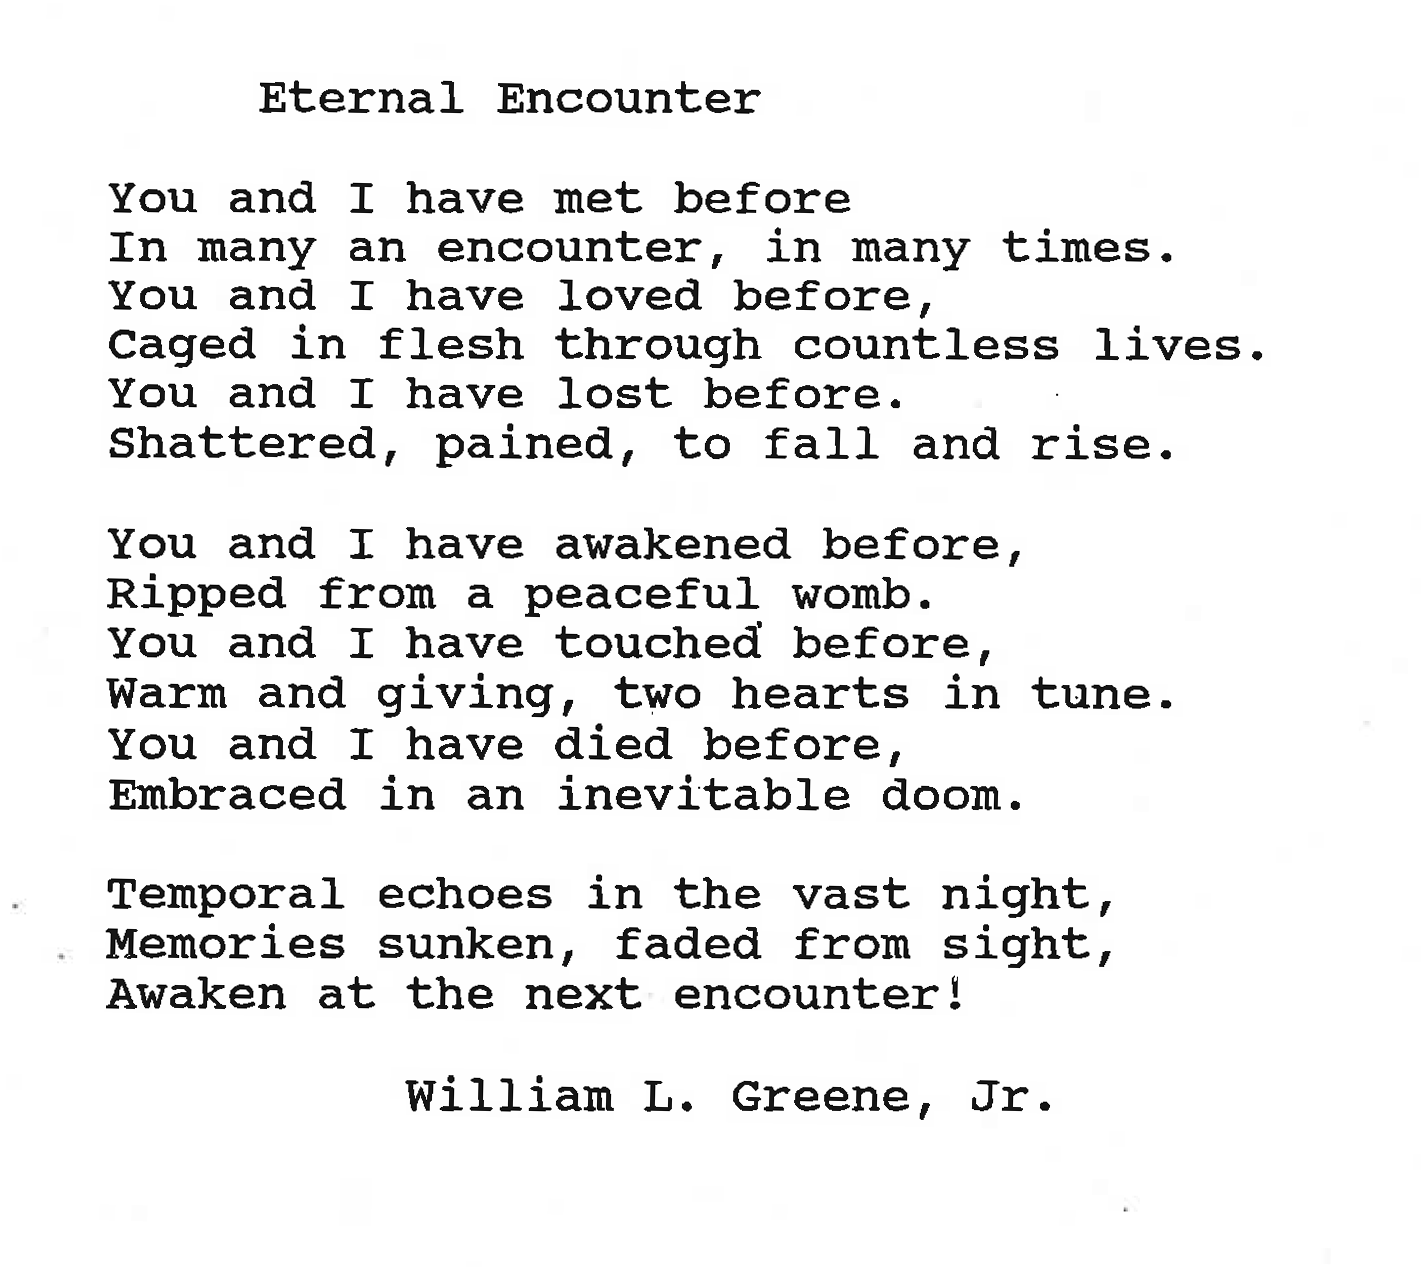 Eternal Encounter